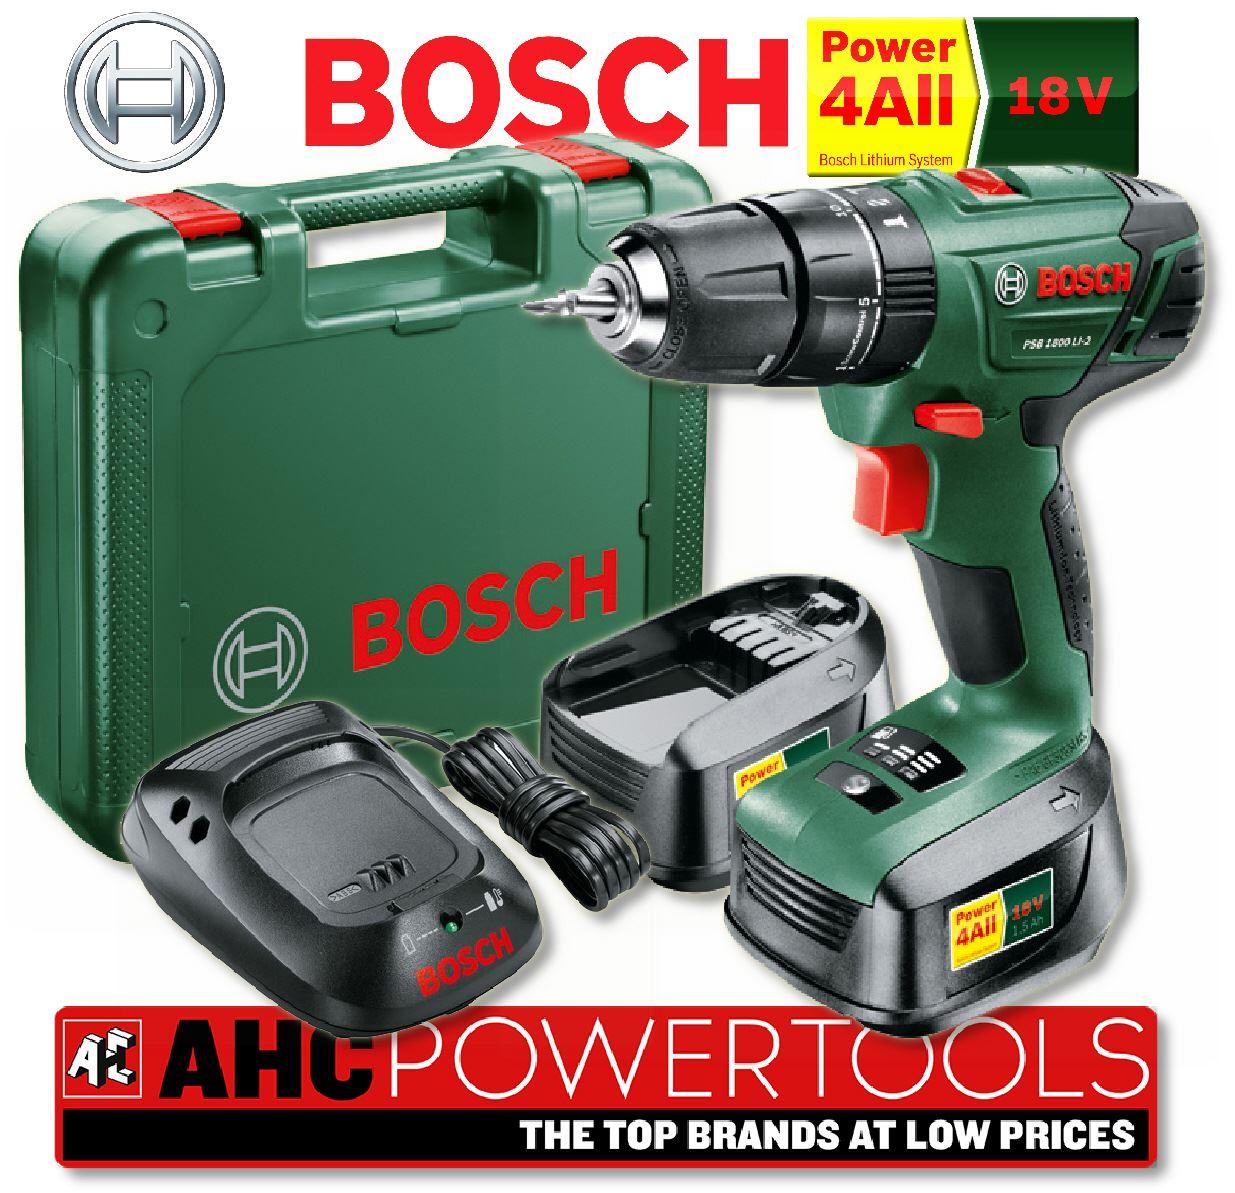 bosch psb 1800 li 2 18v li ion cordless combi drill 2 x 18v batteries ebay. Black Bedroom Furniture Sets. Home Design Ideas